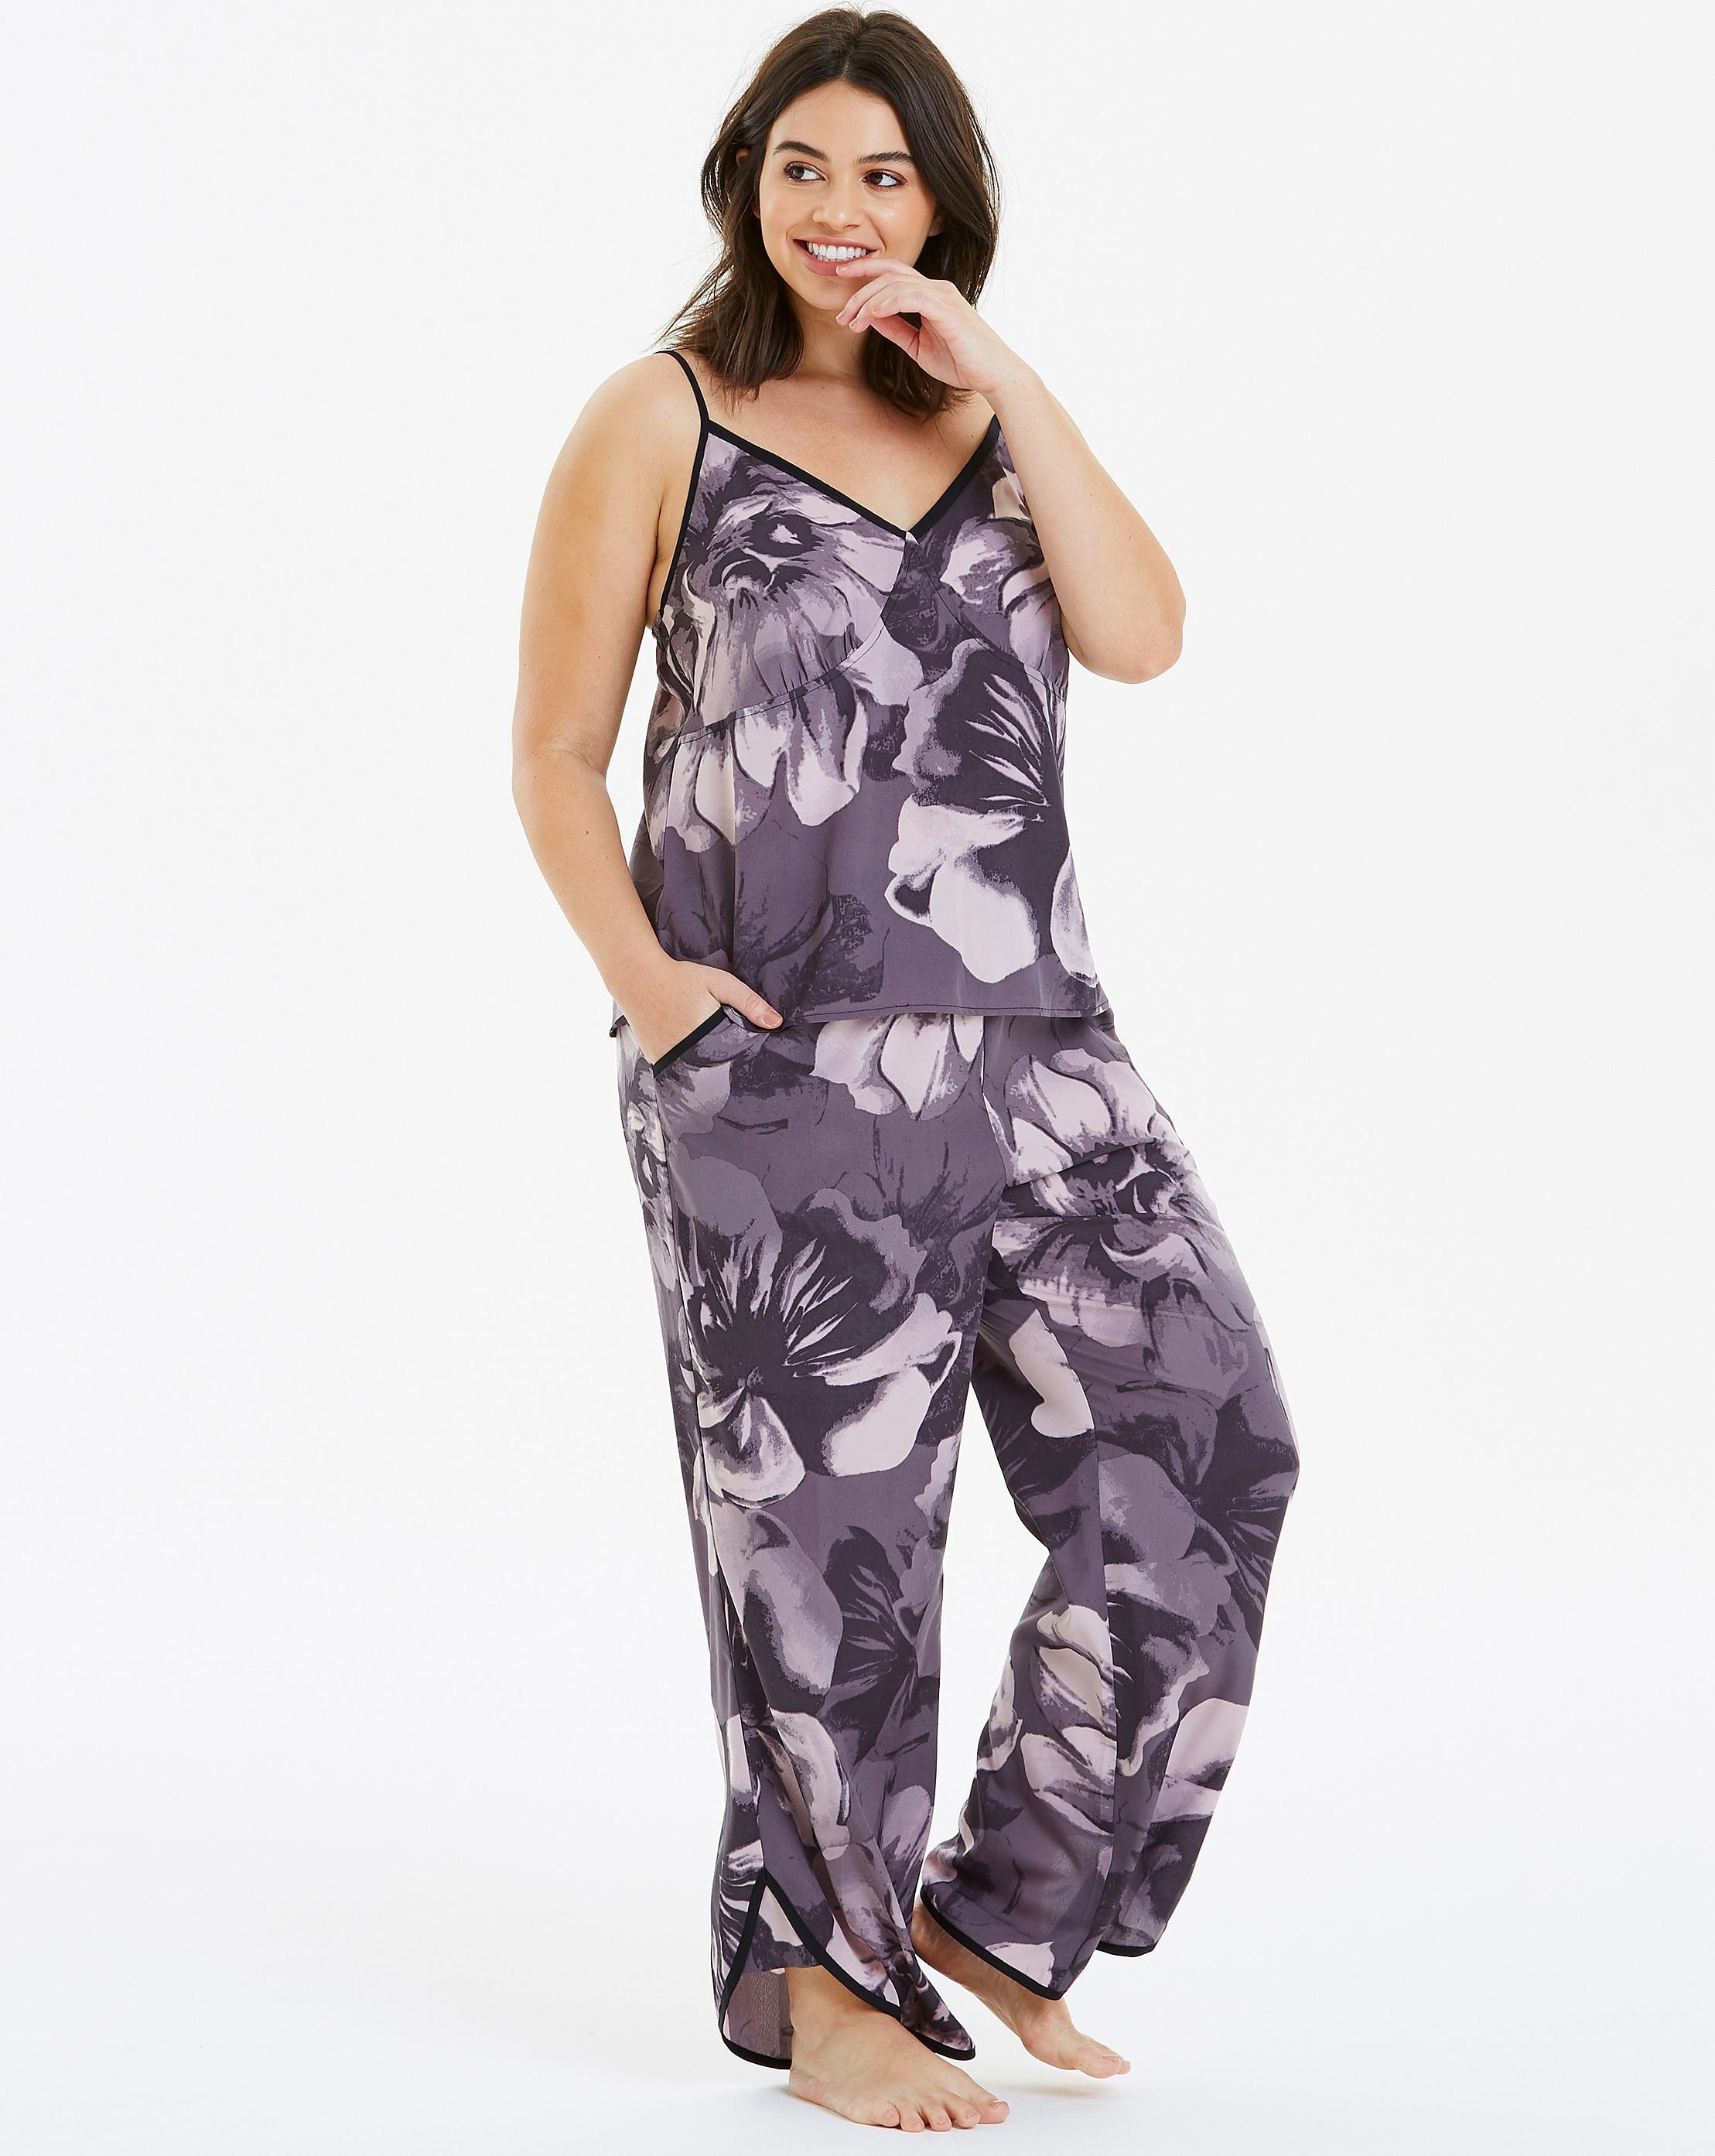 Lyst - Simply Be Pretty Secrets Lace Trim Cami Pj Set in Purple 2438bbc0a